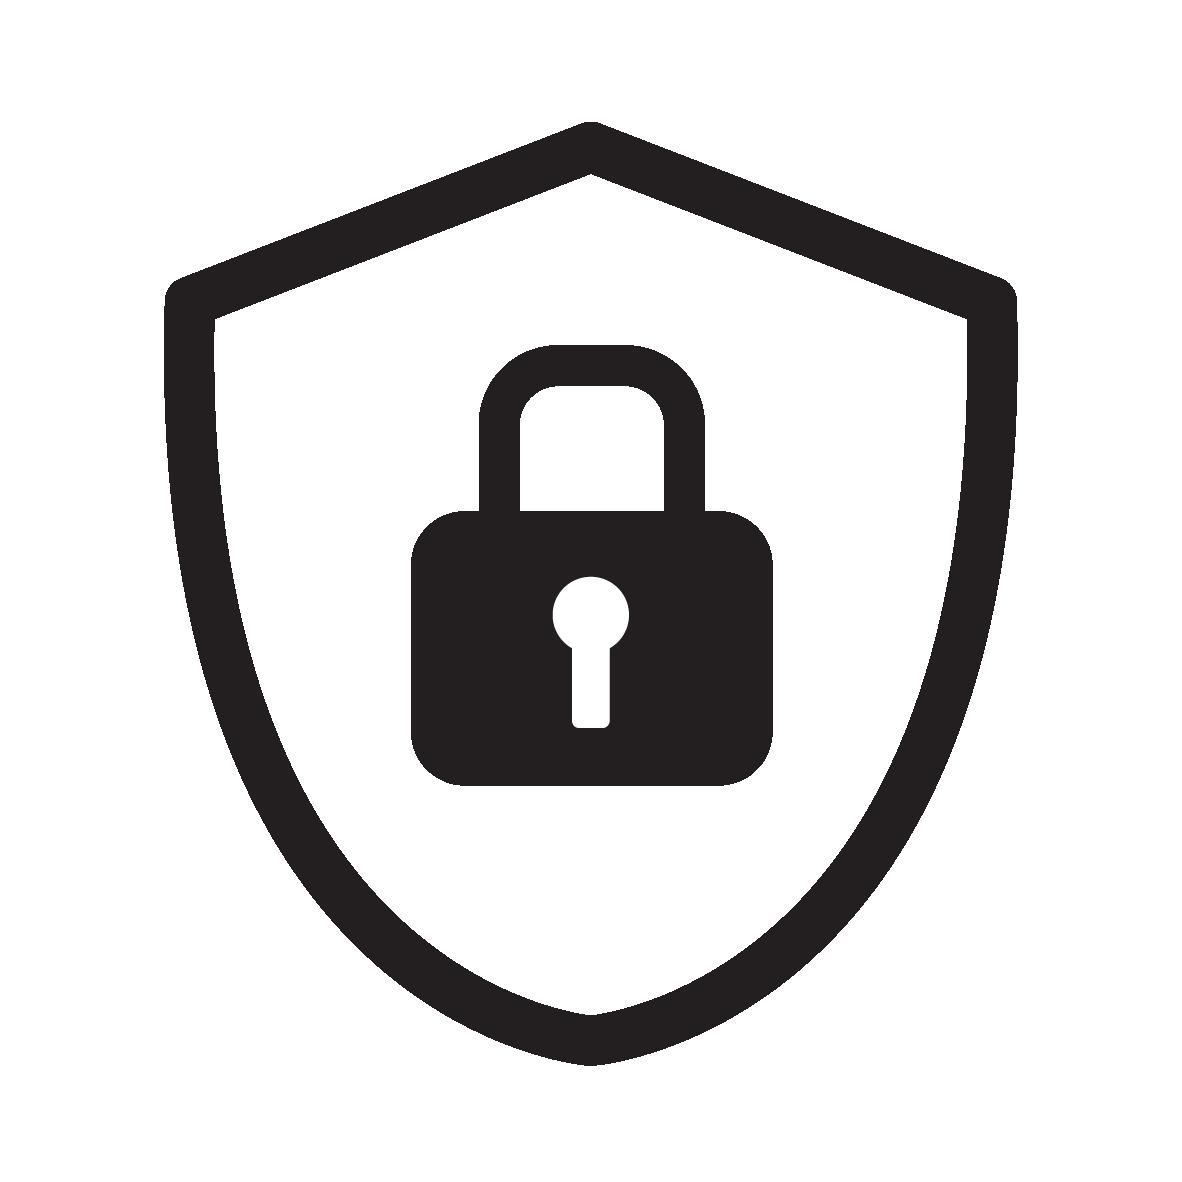 Baanjasmine_Icon_Security.png